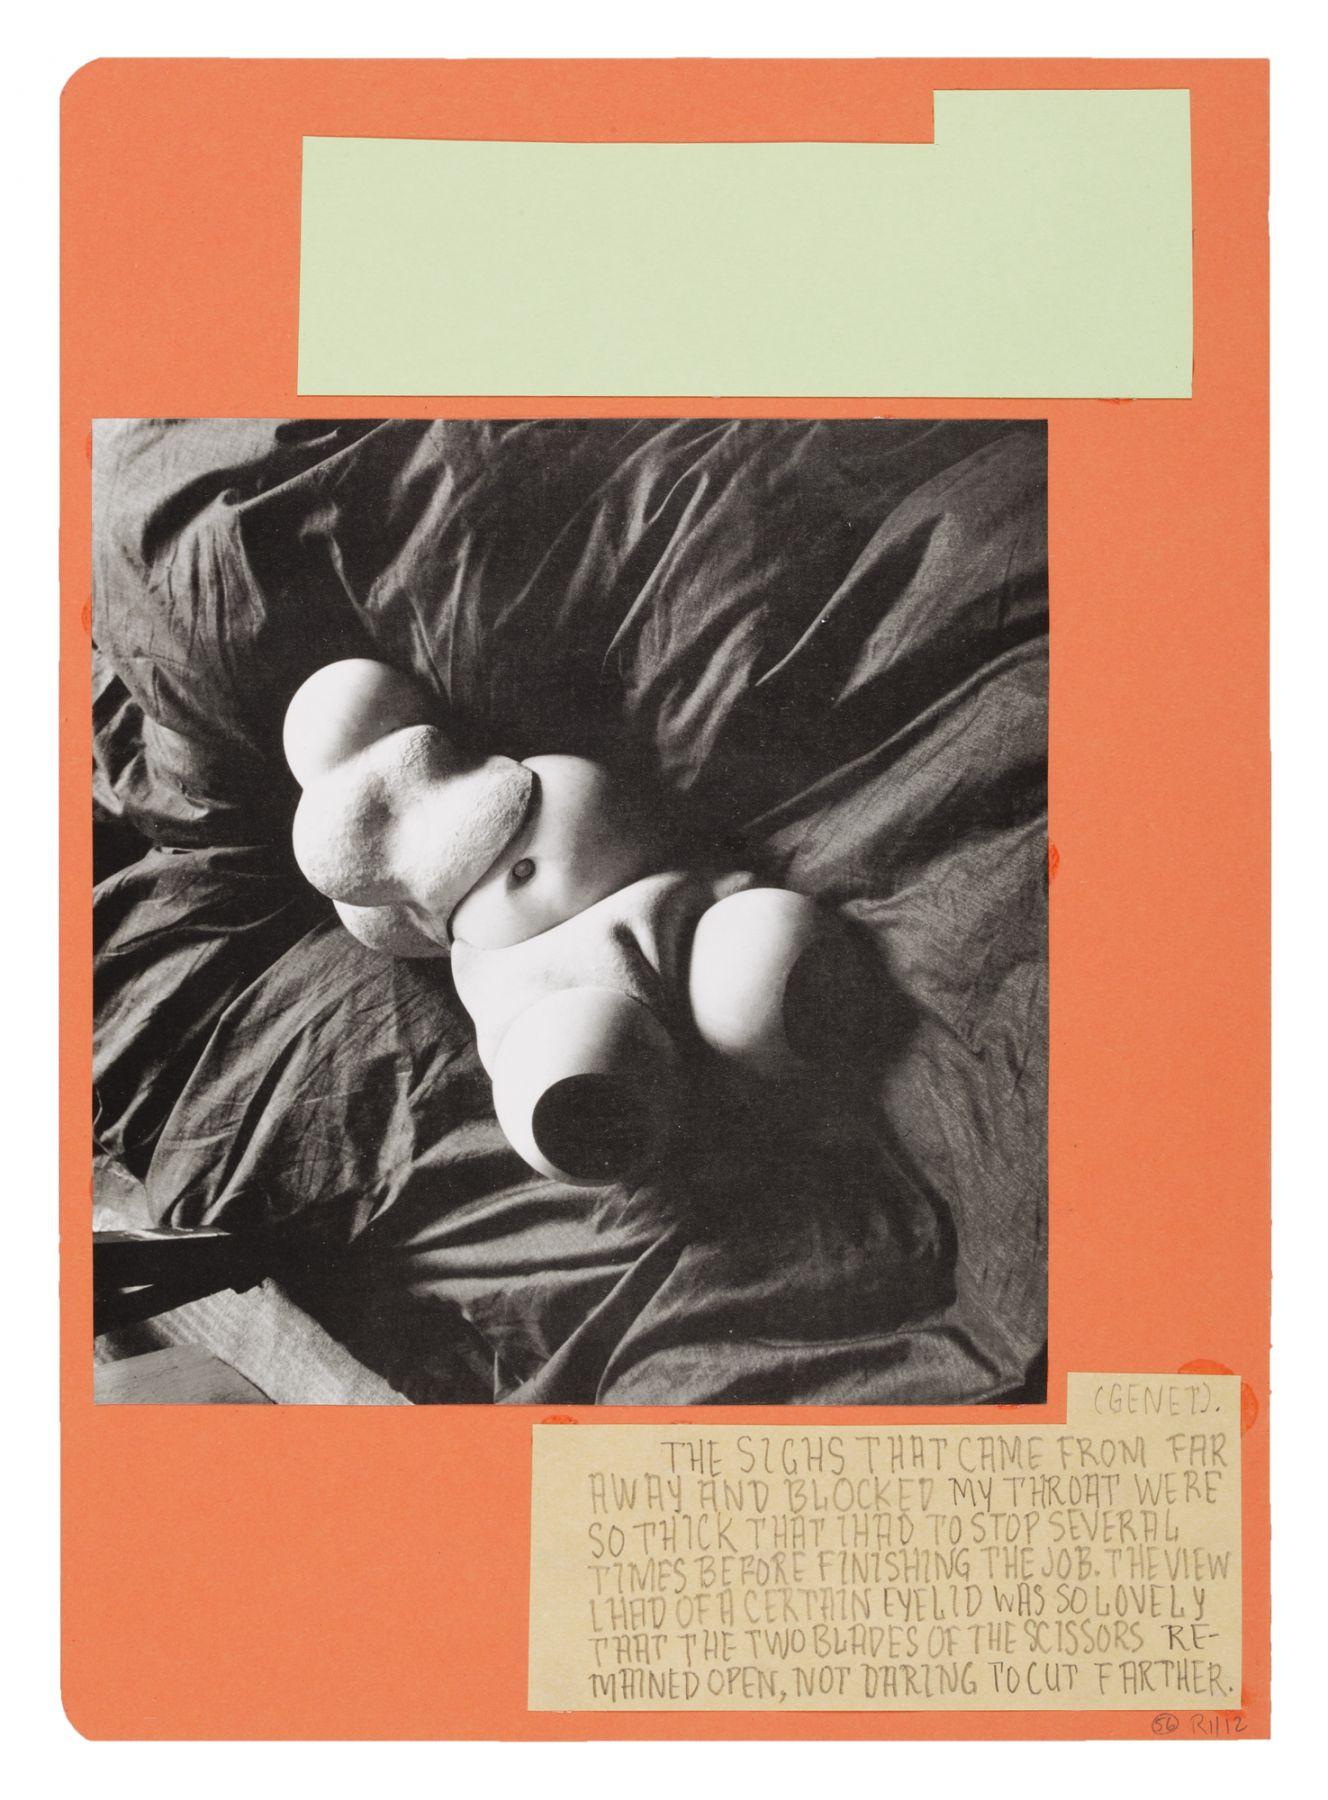 Richard Hawkins  Ankoku 56 (Disbellmered), 2012  Collage  18 1/8 x 14 1/2 x 1 inches (46 x 36.8 x 2.5 cm)